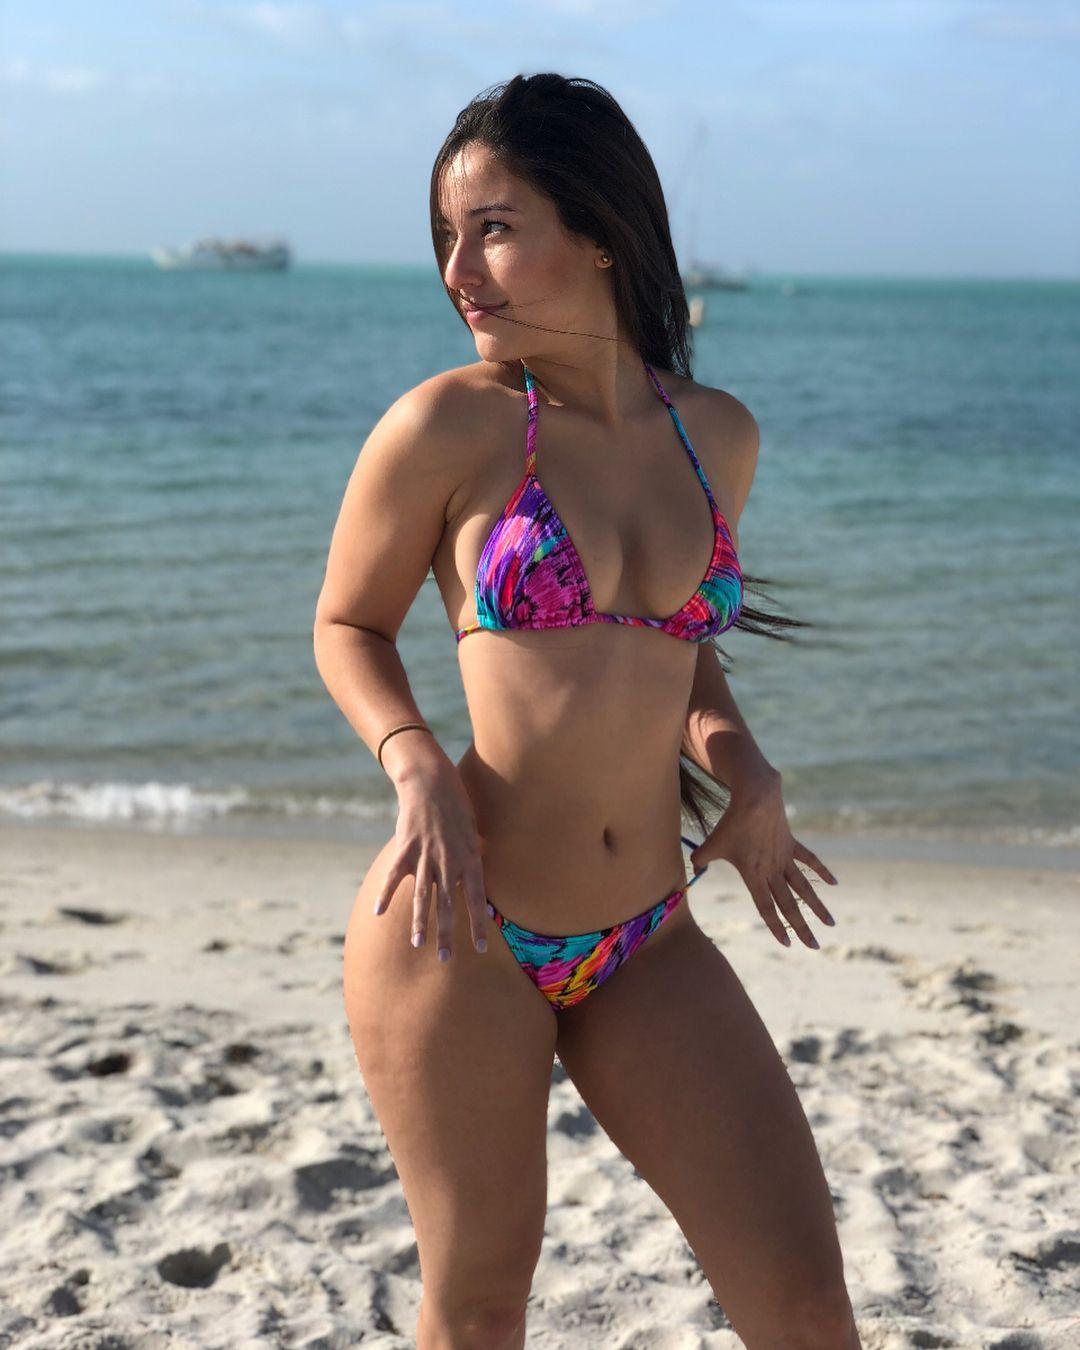 c182b4b3d1  Bikini-curvish moments  angievarona  fashion  ootd  swimsuit  swimwear